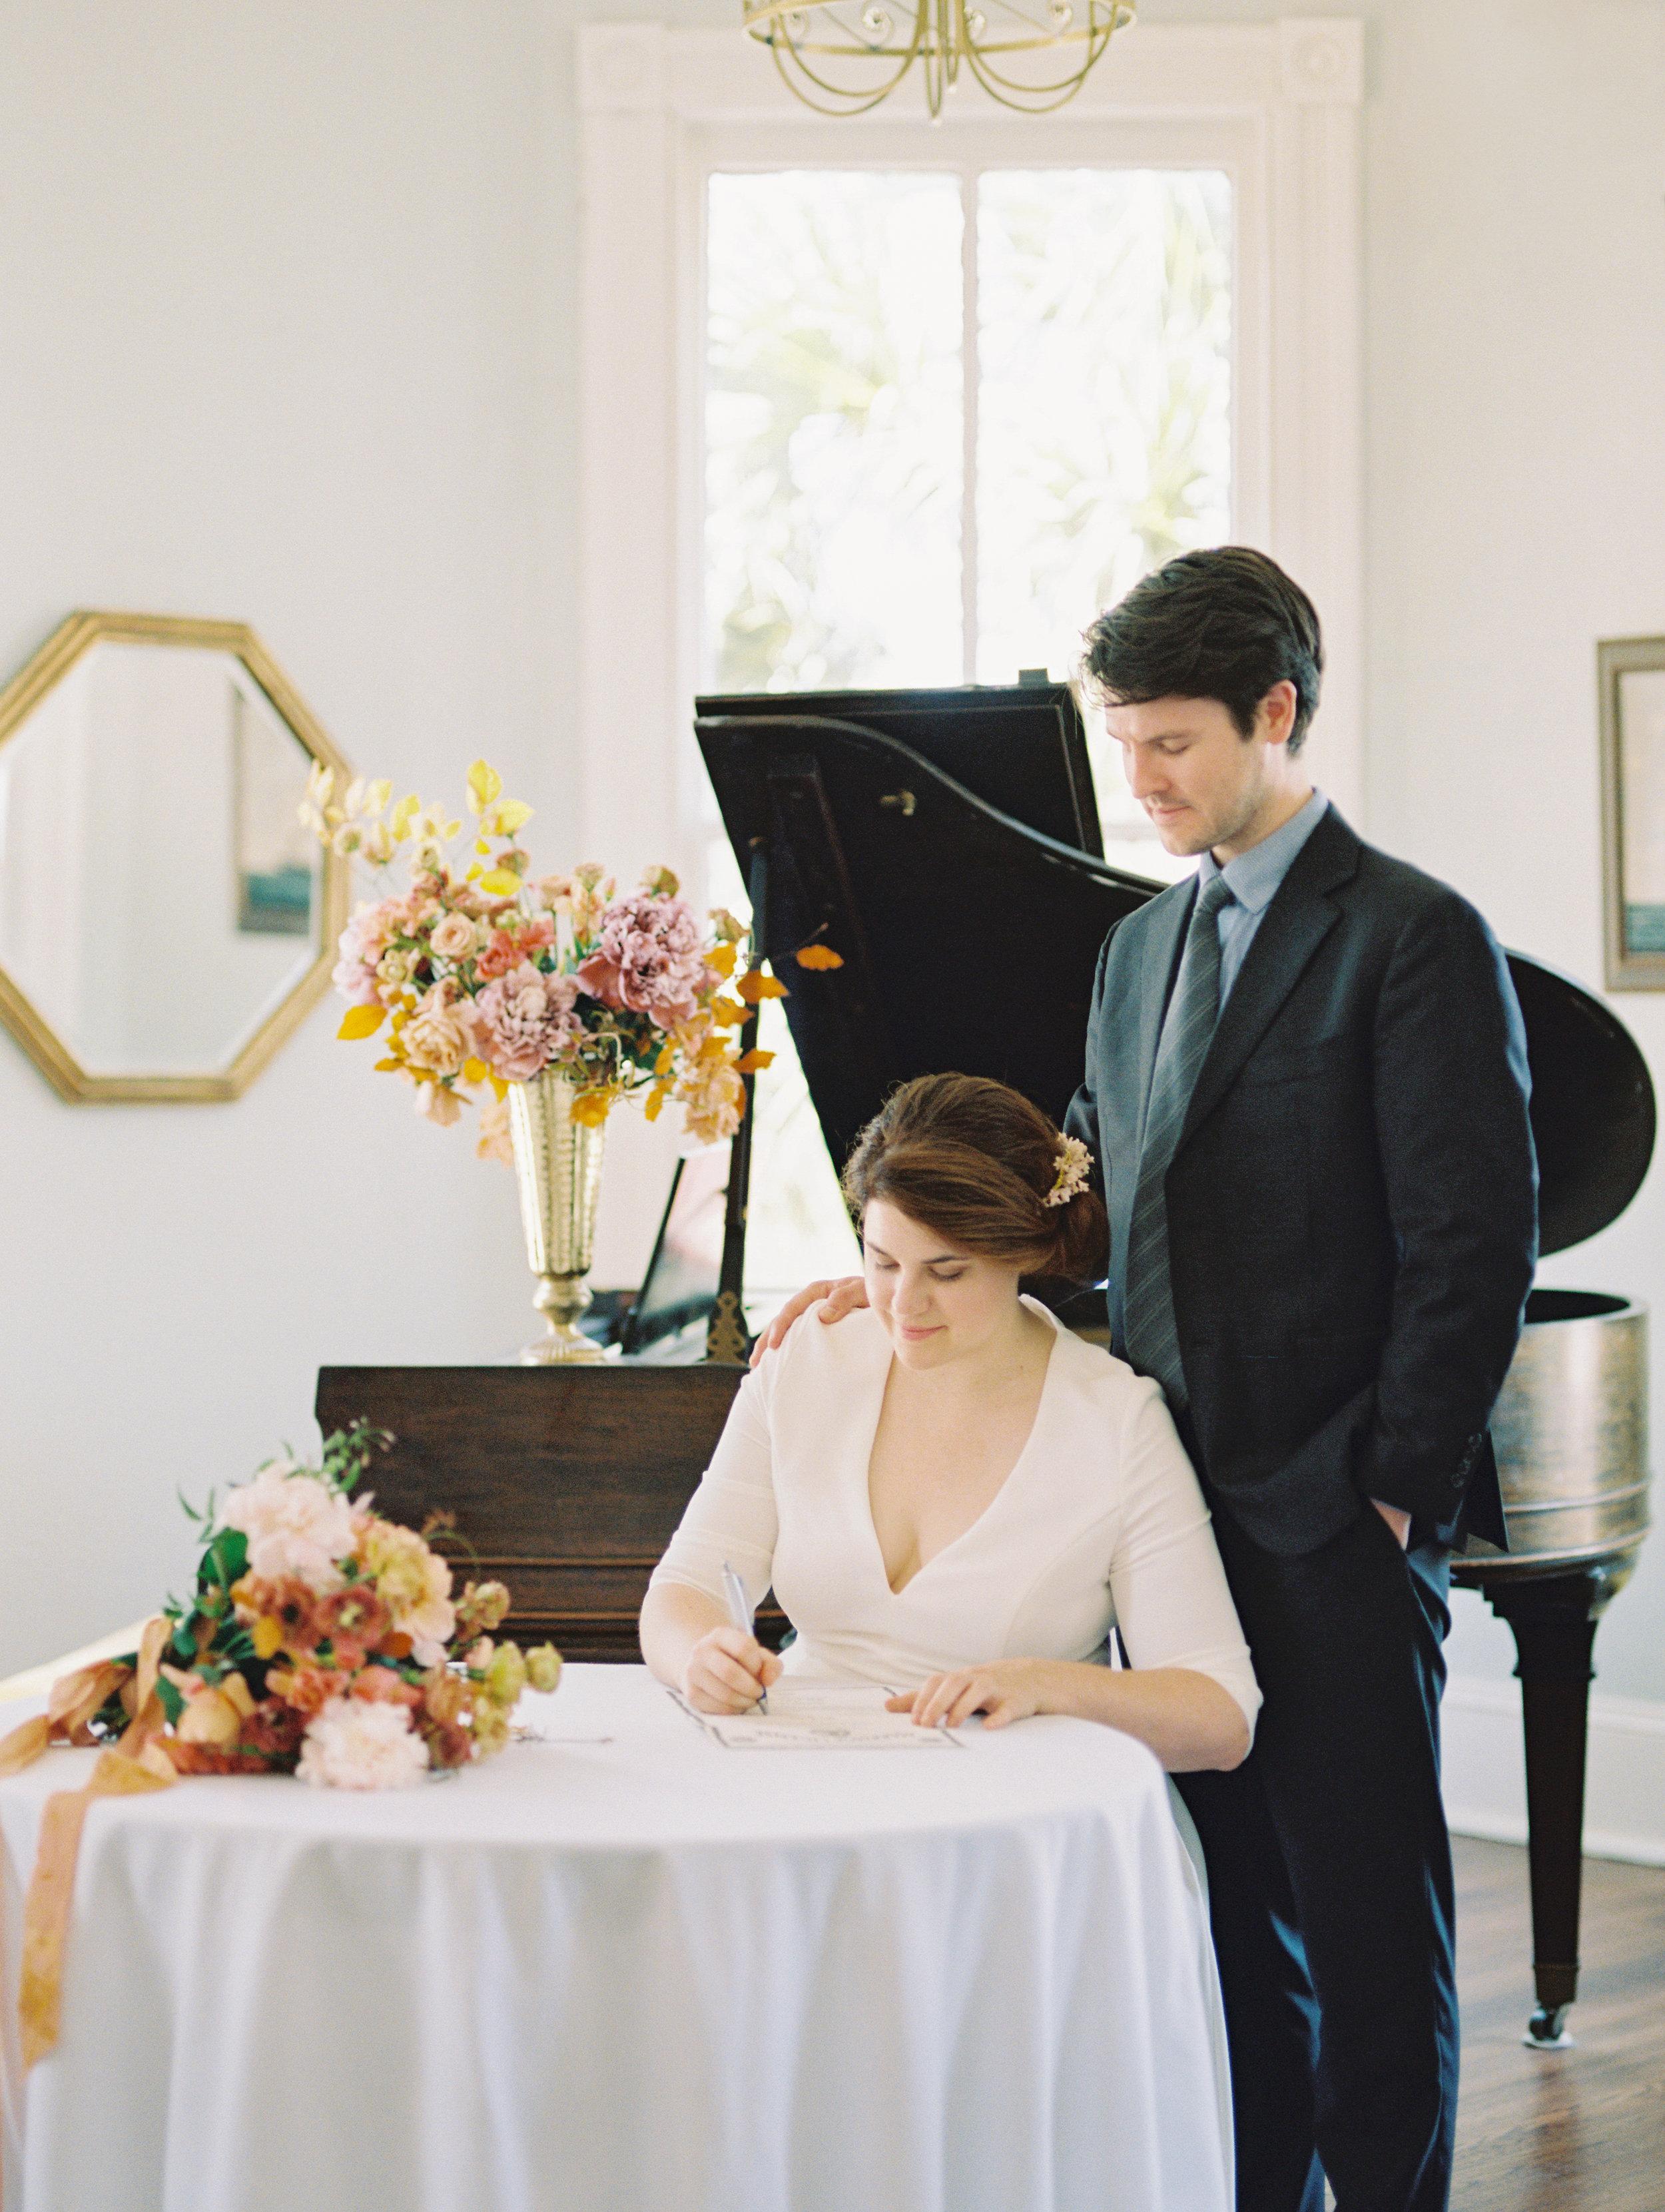 Elizabeth and Scott - Divya Pande Photography-93.jpg